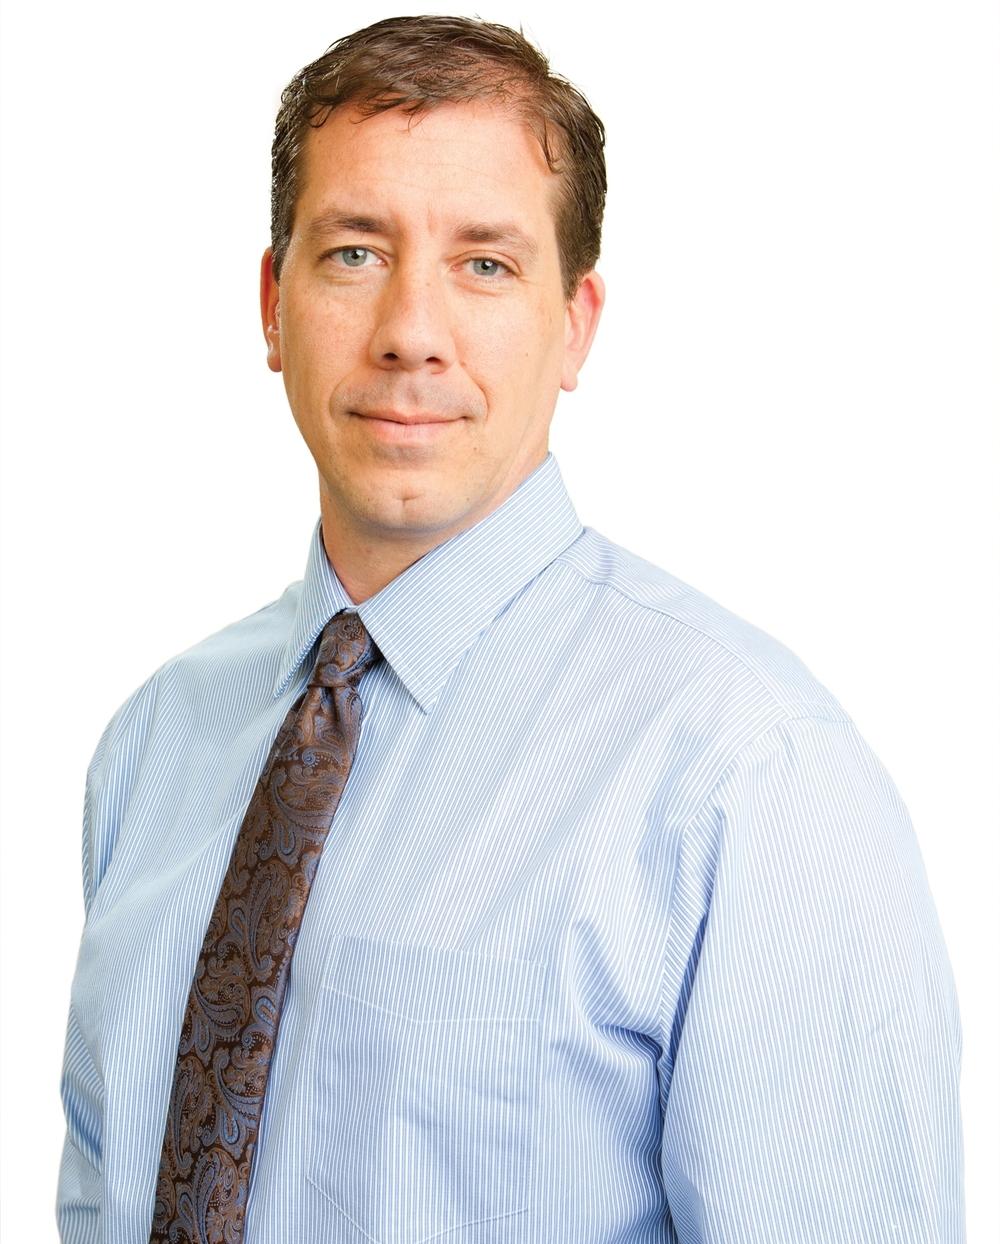 Dr. Michael O'Neill